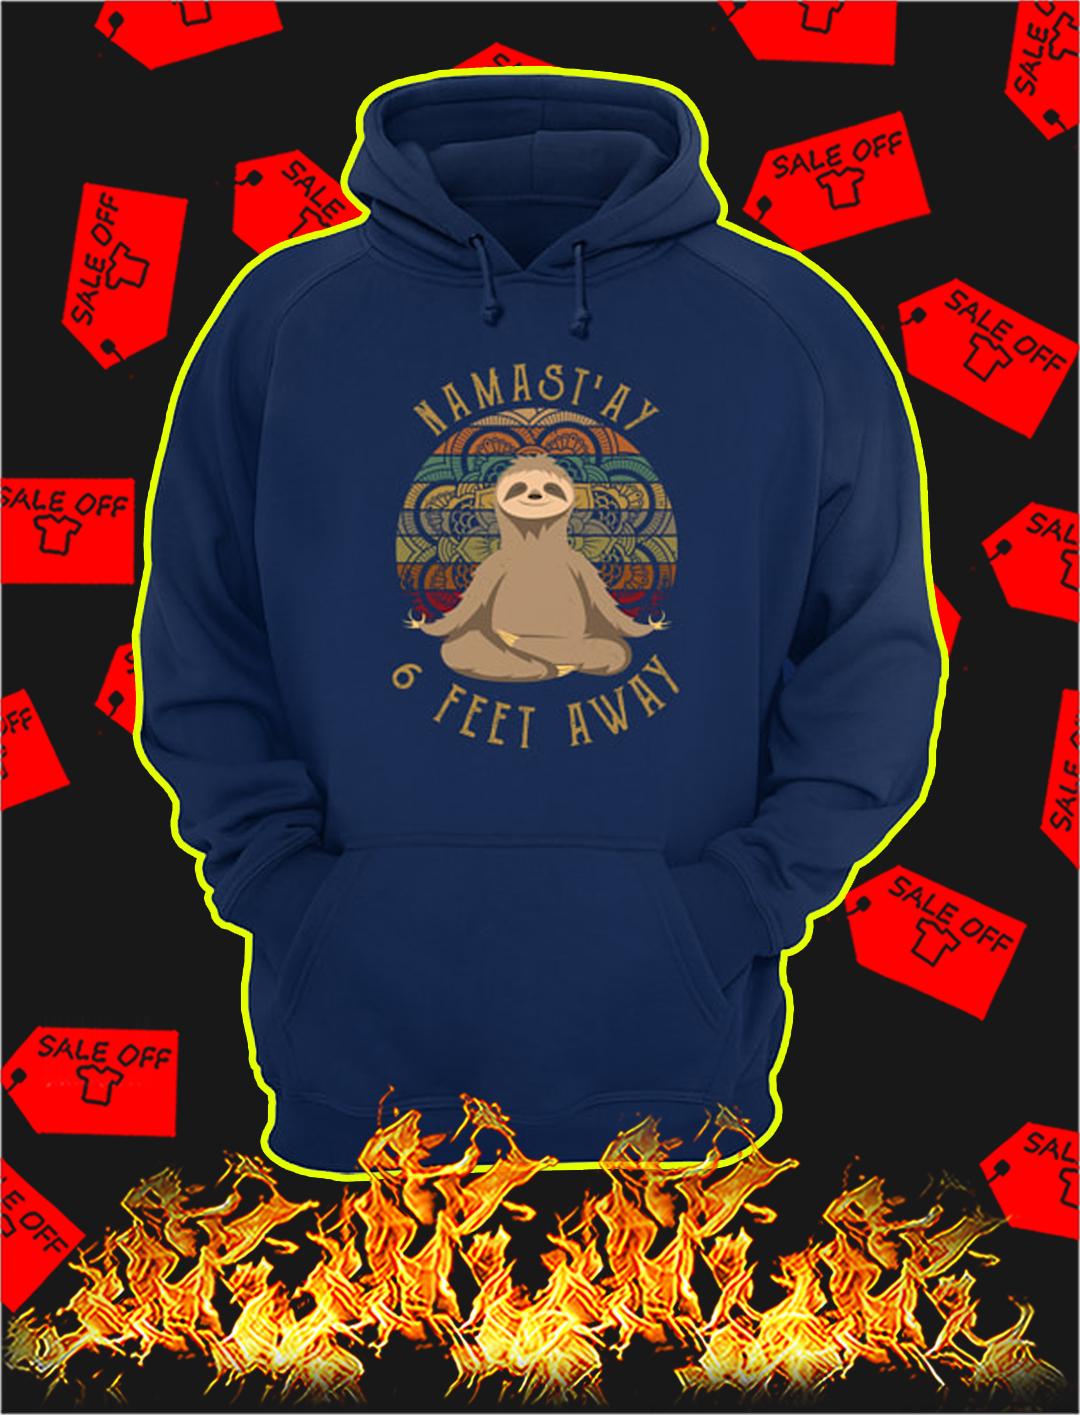 Sloth namast'ay 6 feet away hoodie